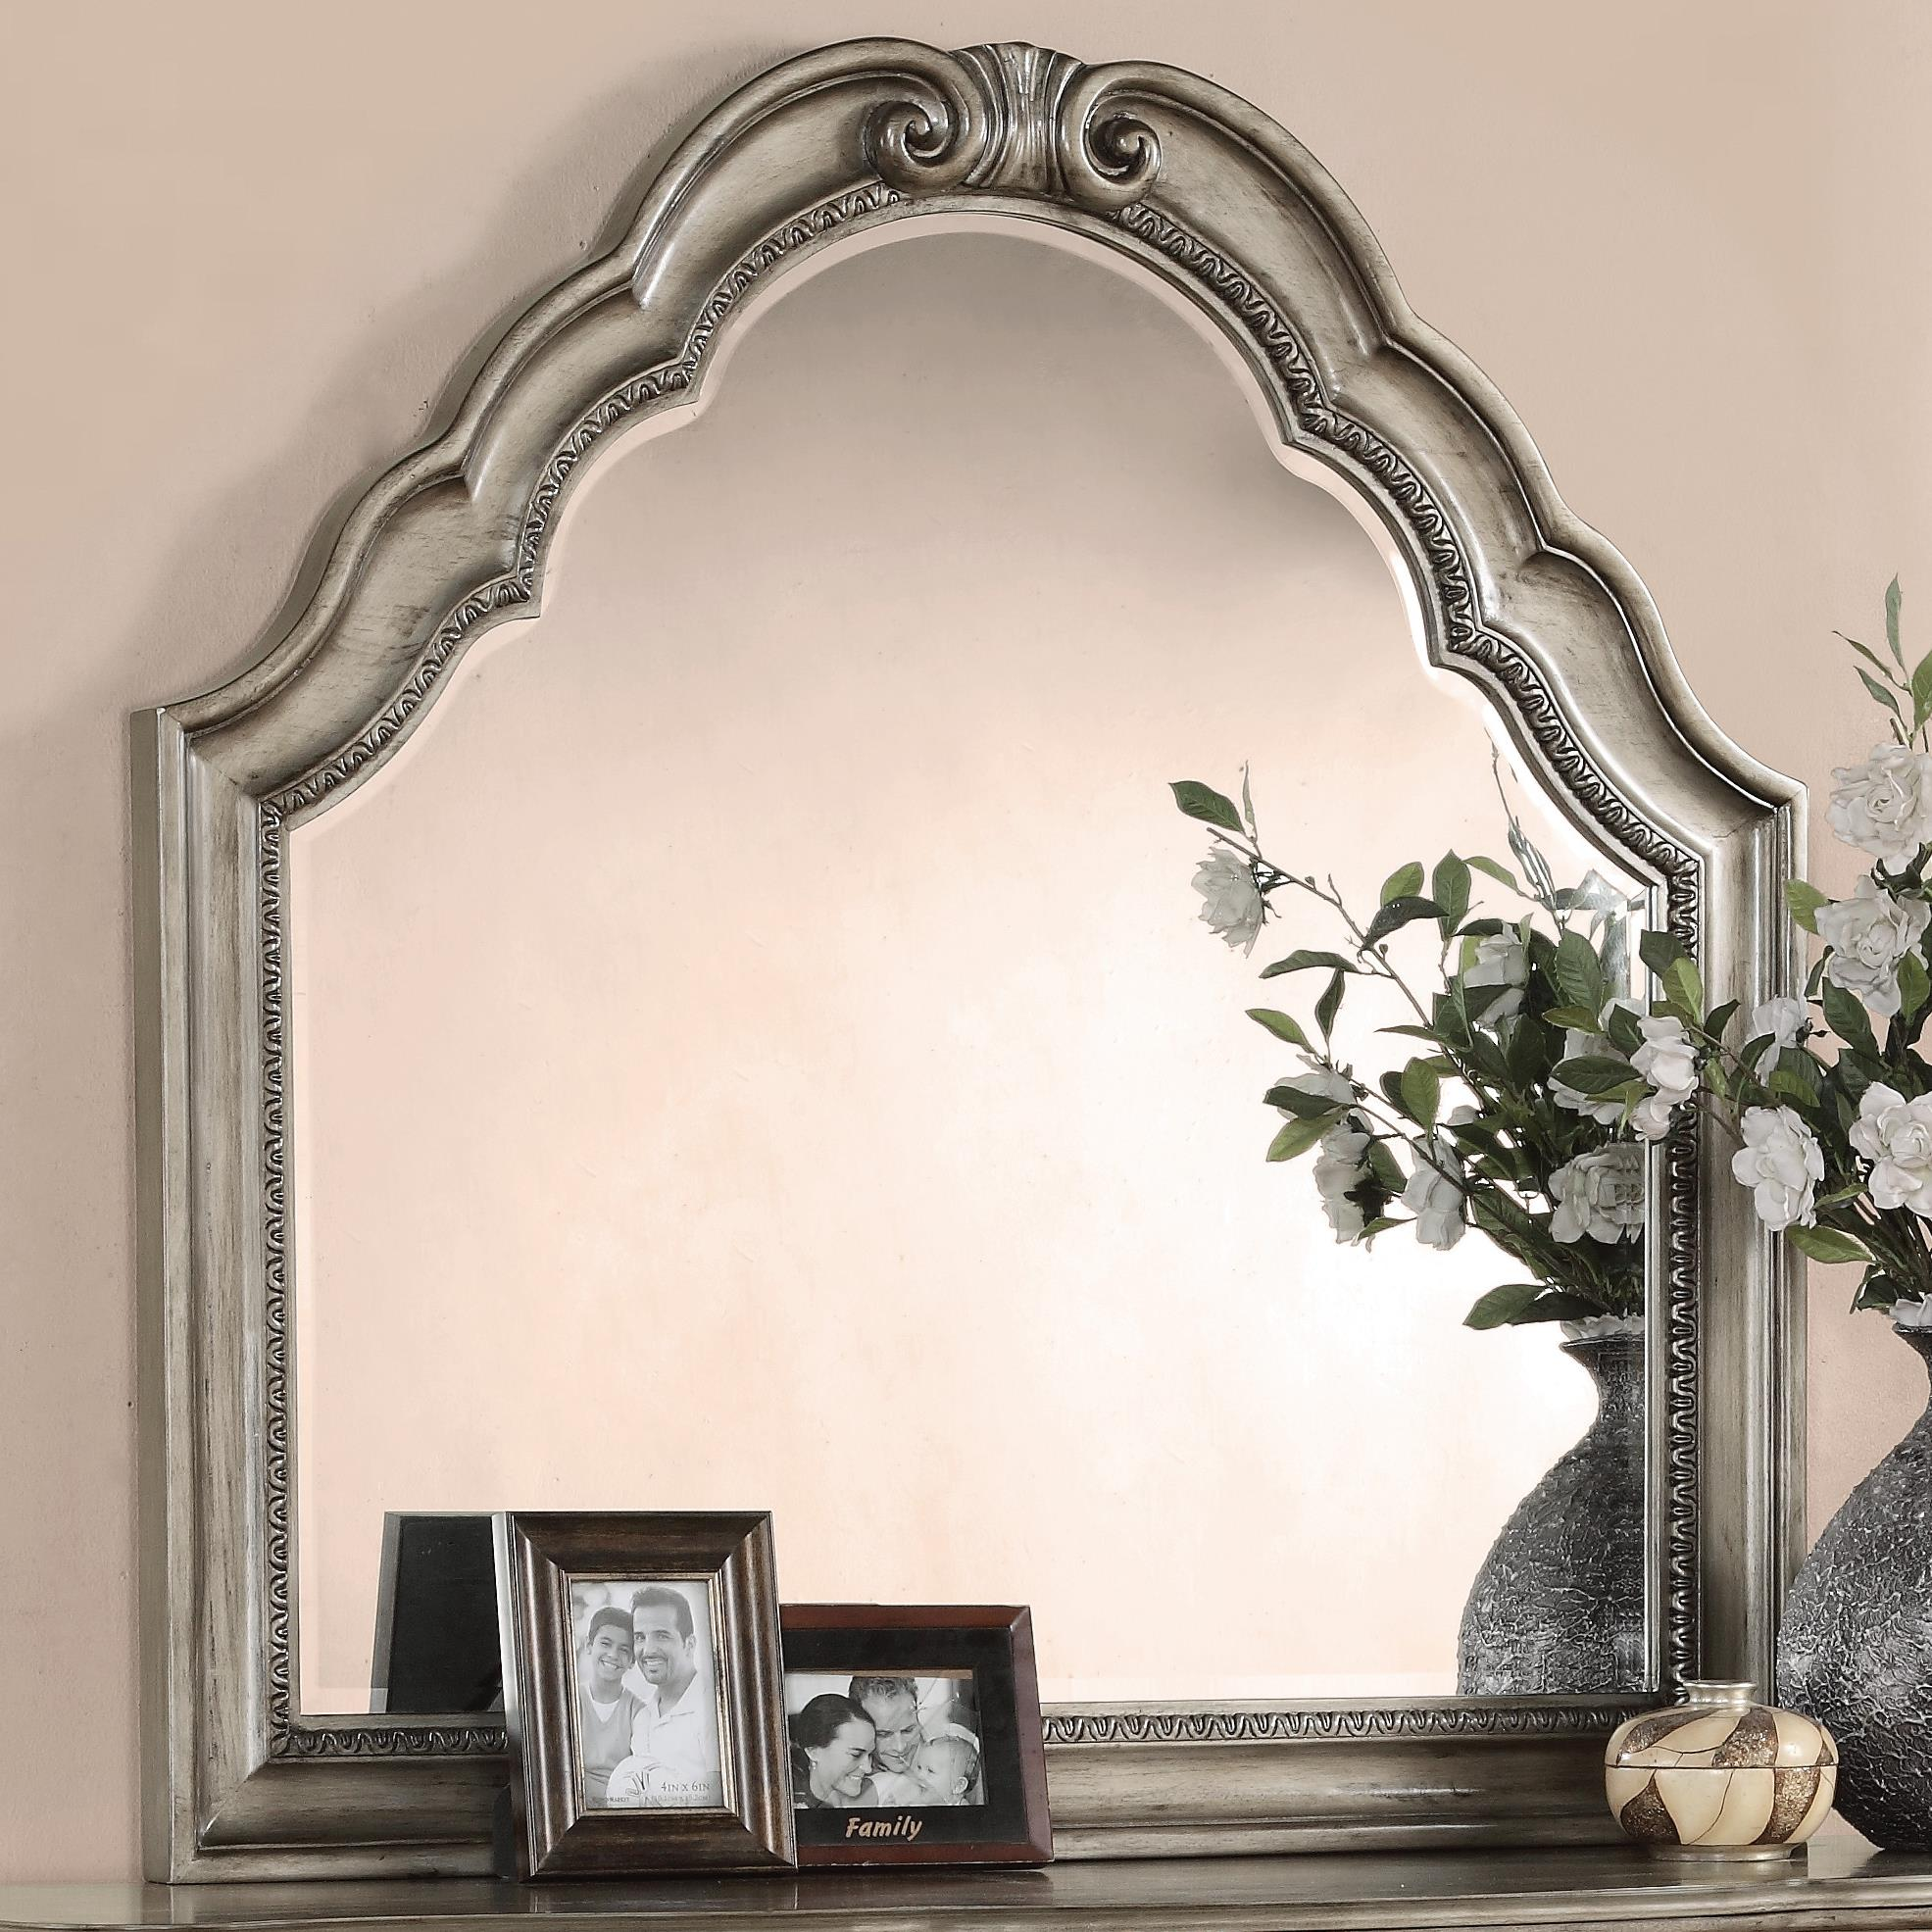 Flexsteel Wynwood Collection San Cristobal Mirror - Item Number: W1957-880